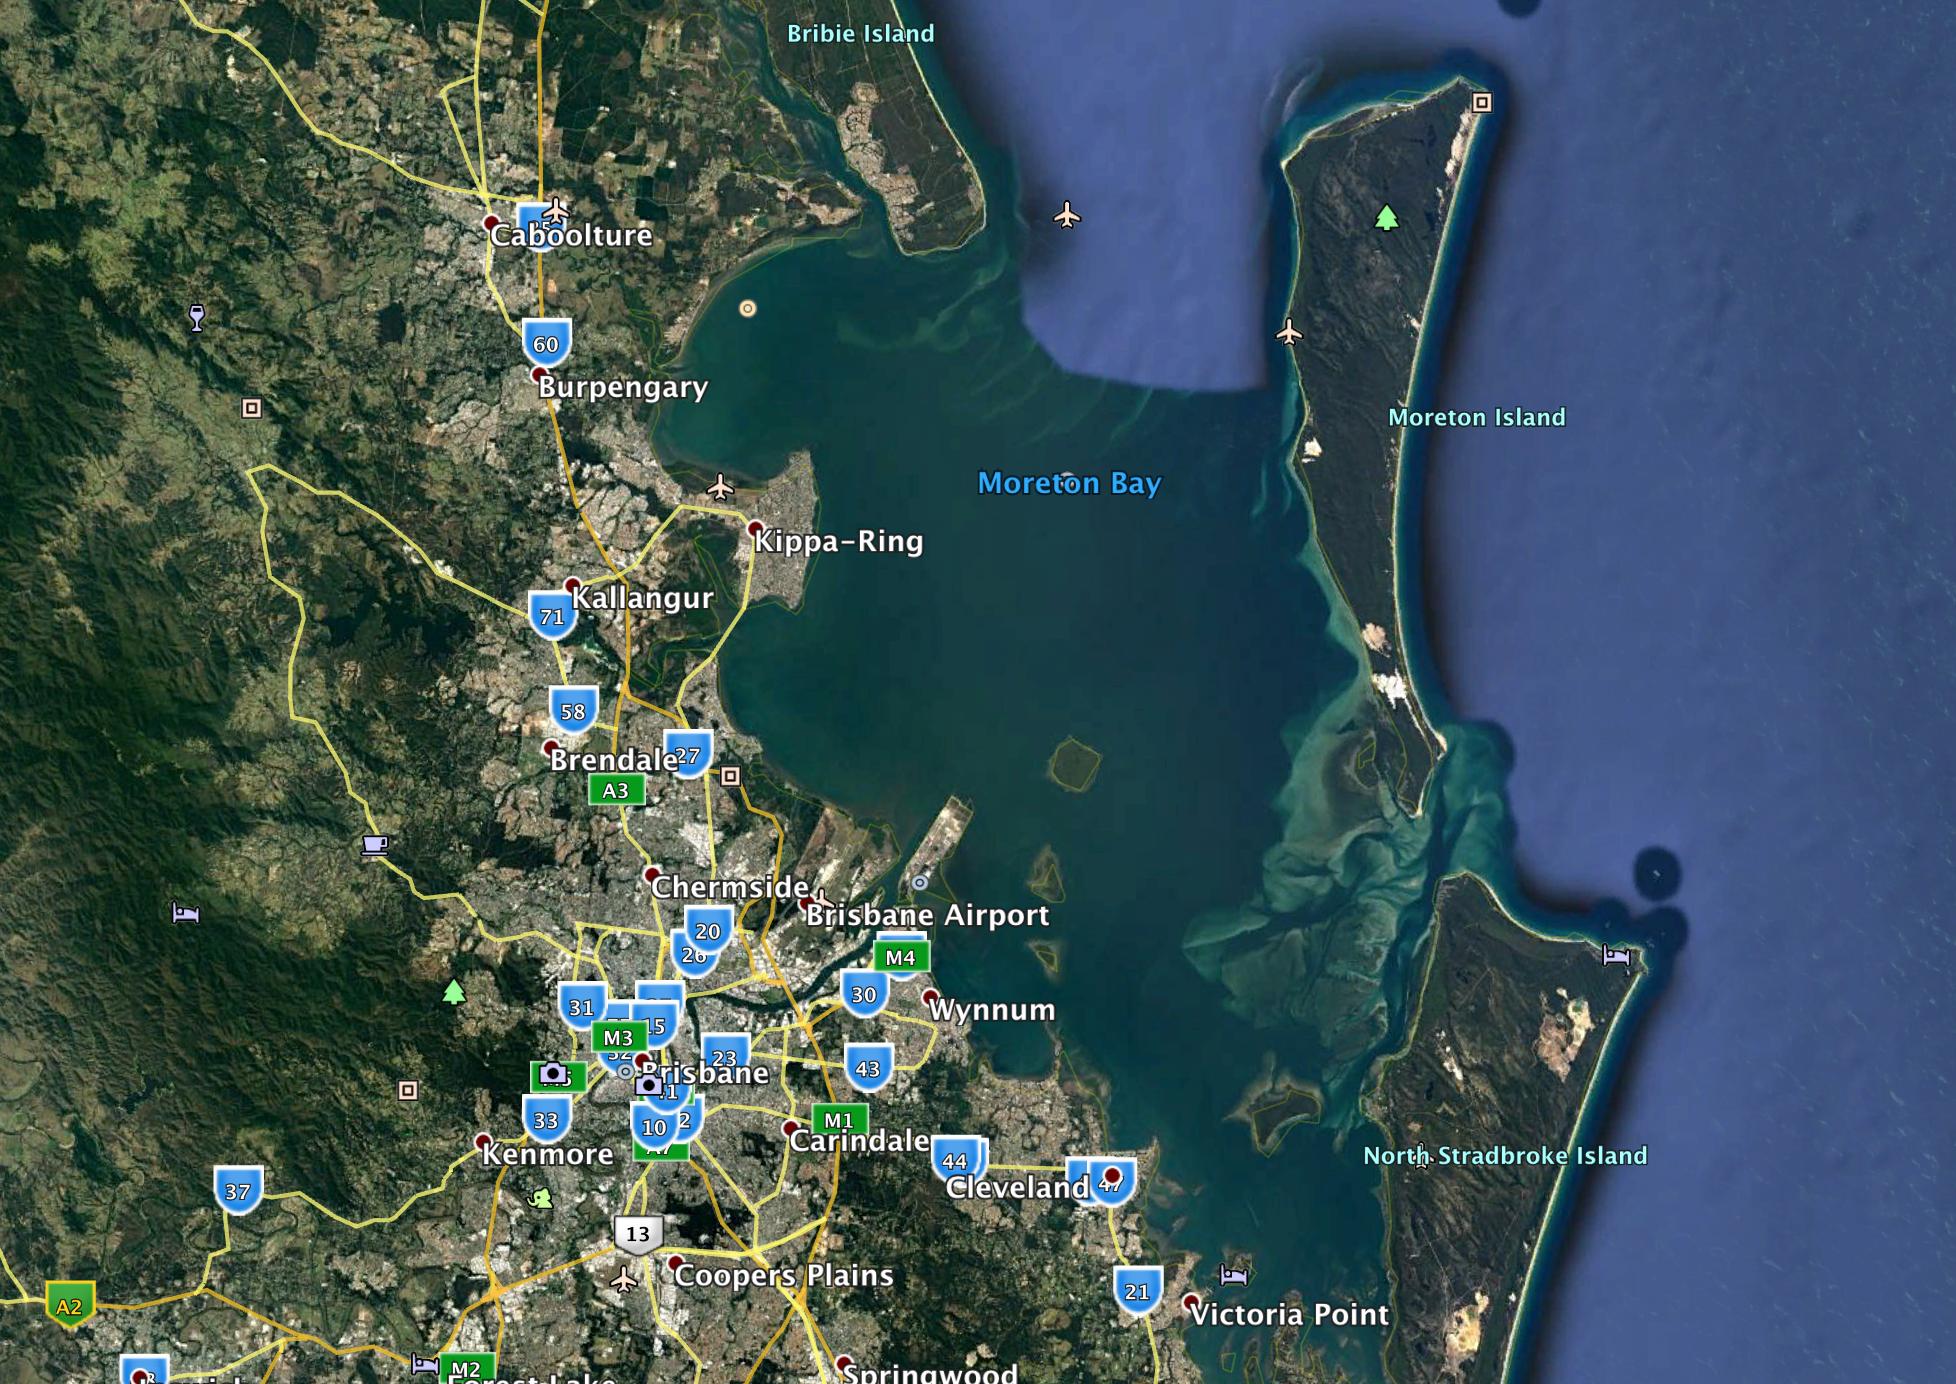 Moreton Bay, east of Brisbane a great venue for a regatta